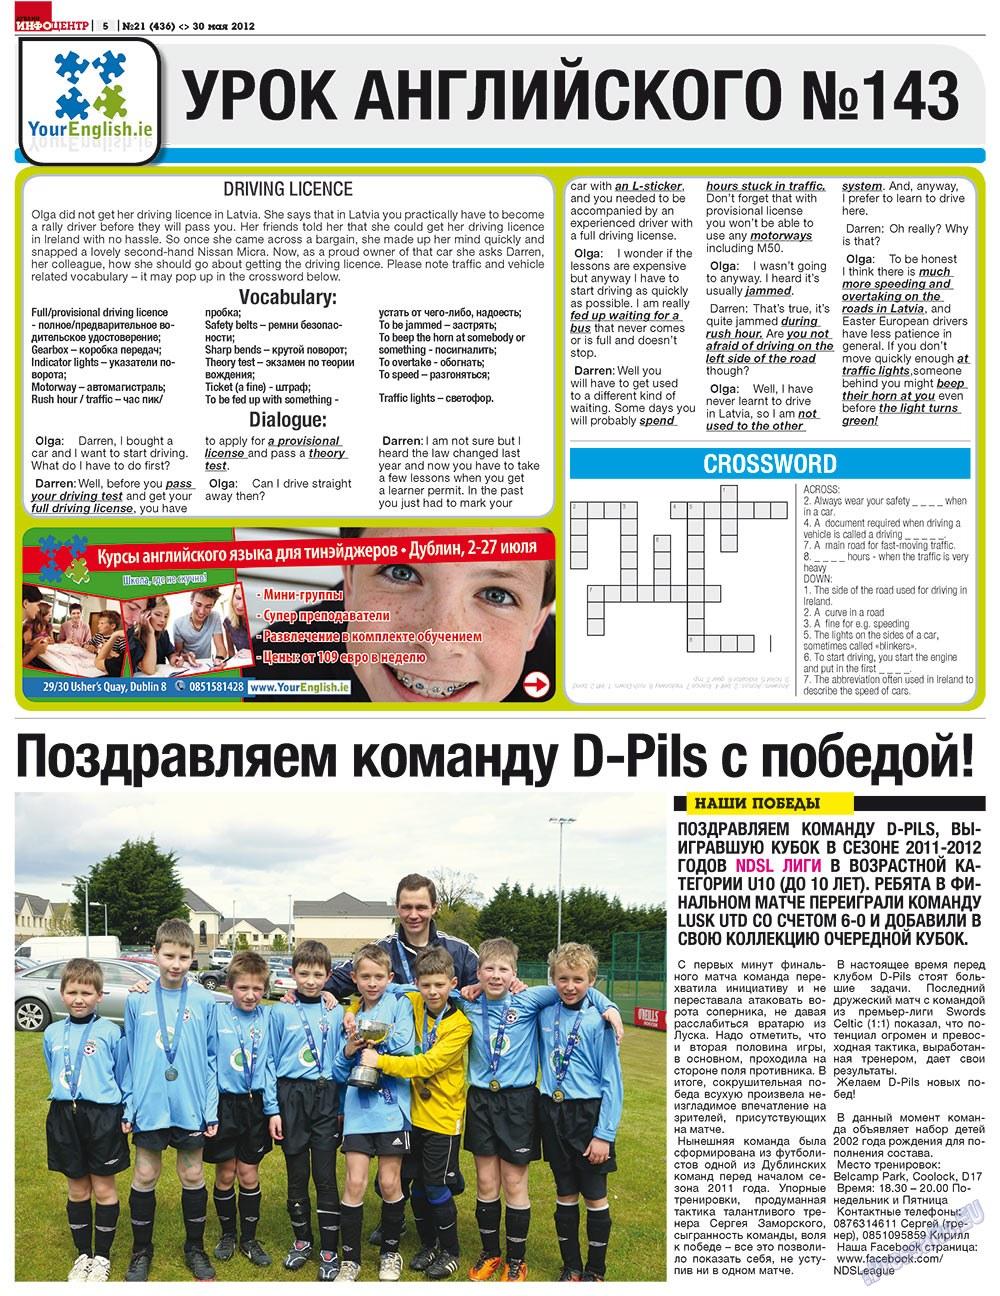 Дублин инфоцентр (газета). 2012 год, номер 21, стр. 5